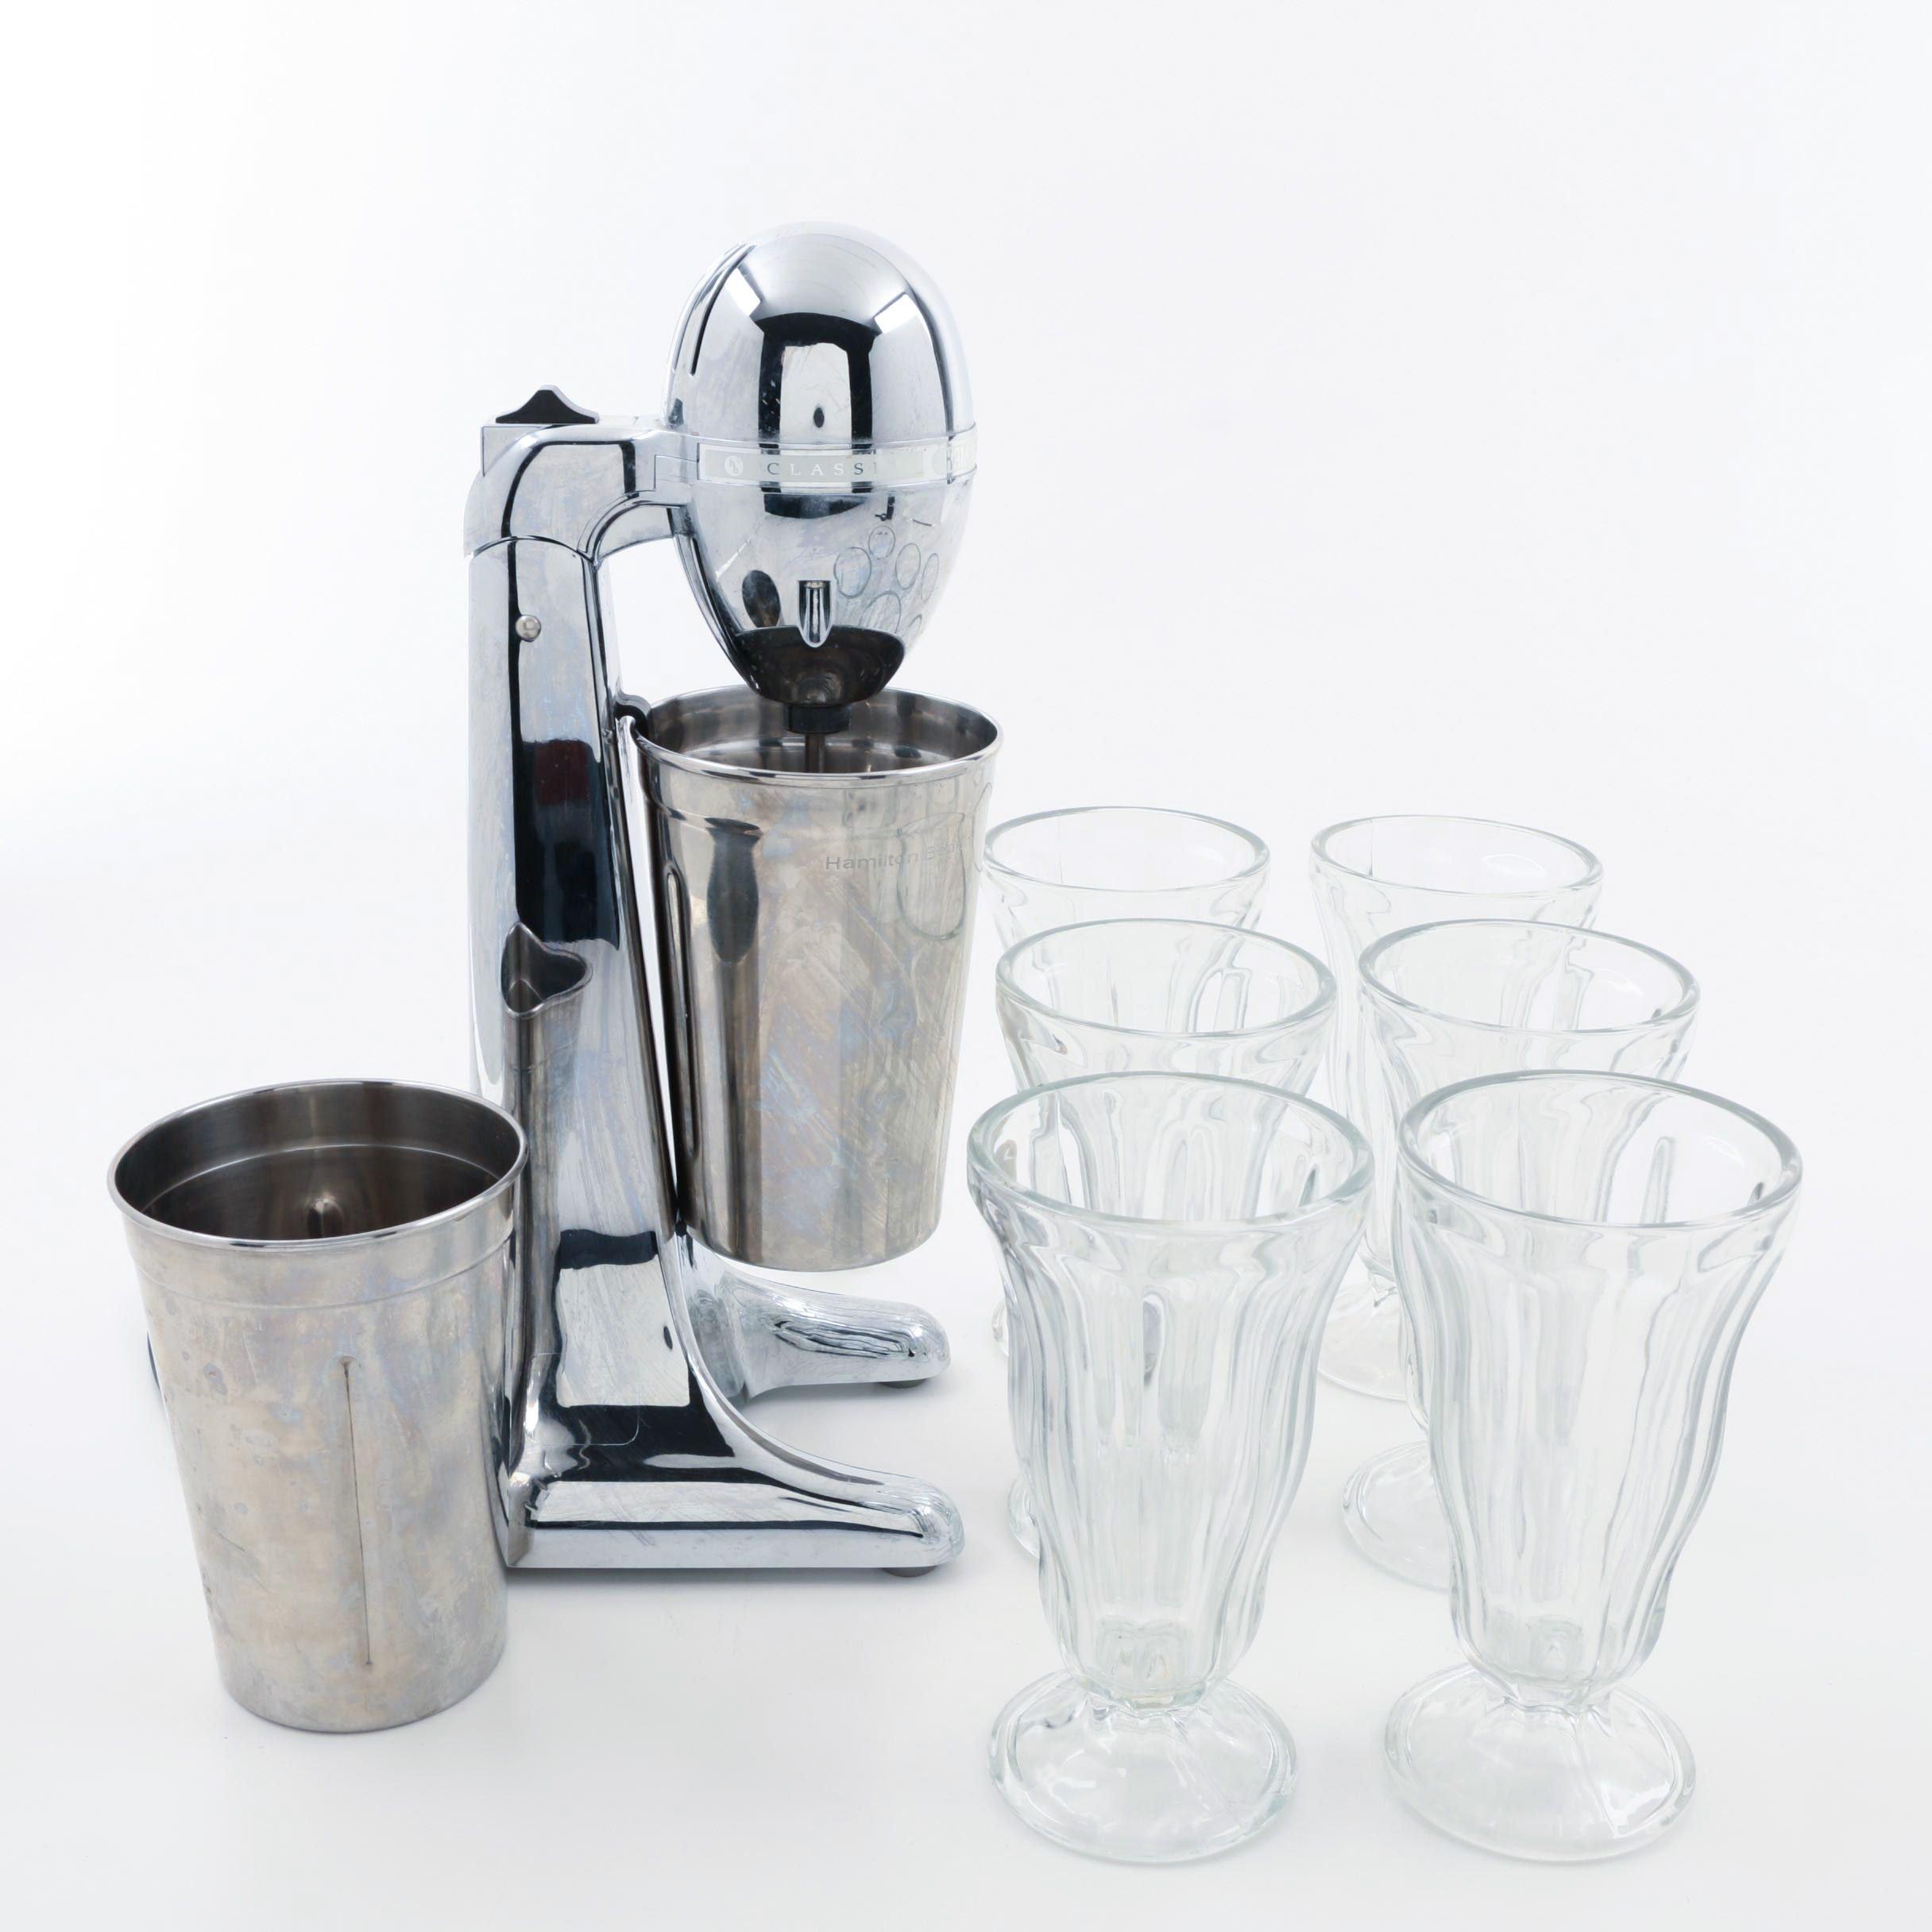 "Hamilton Beach ""Drink Master"" and Anchor Hocking ""Fountainware"" Glassware"